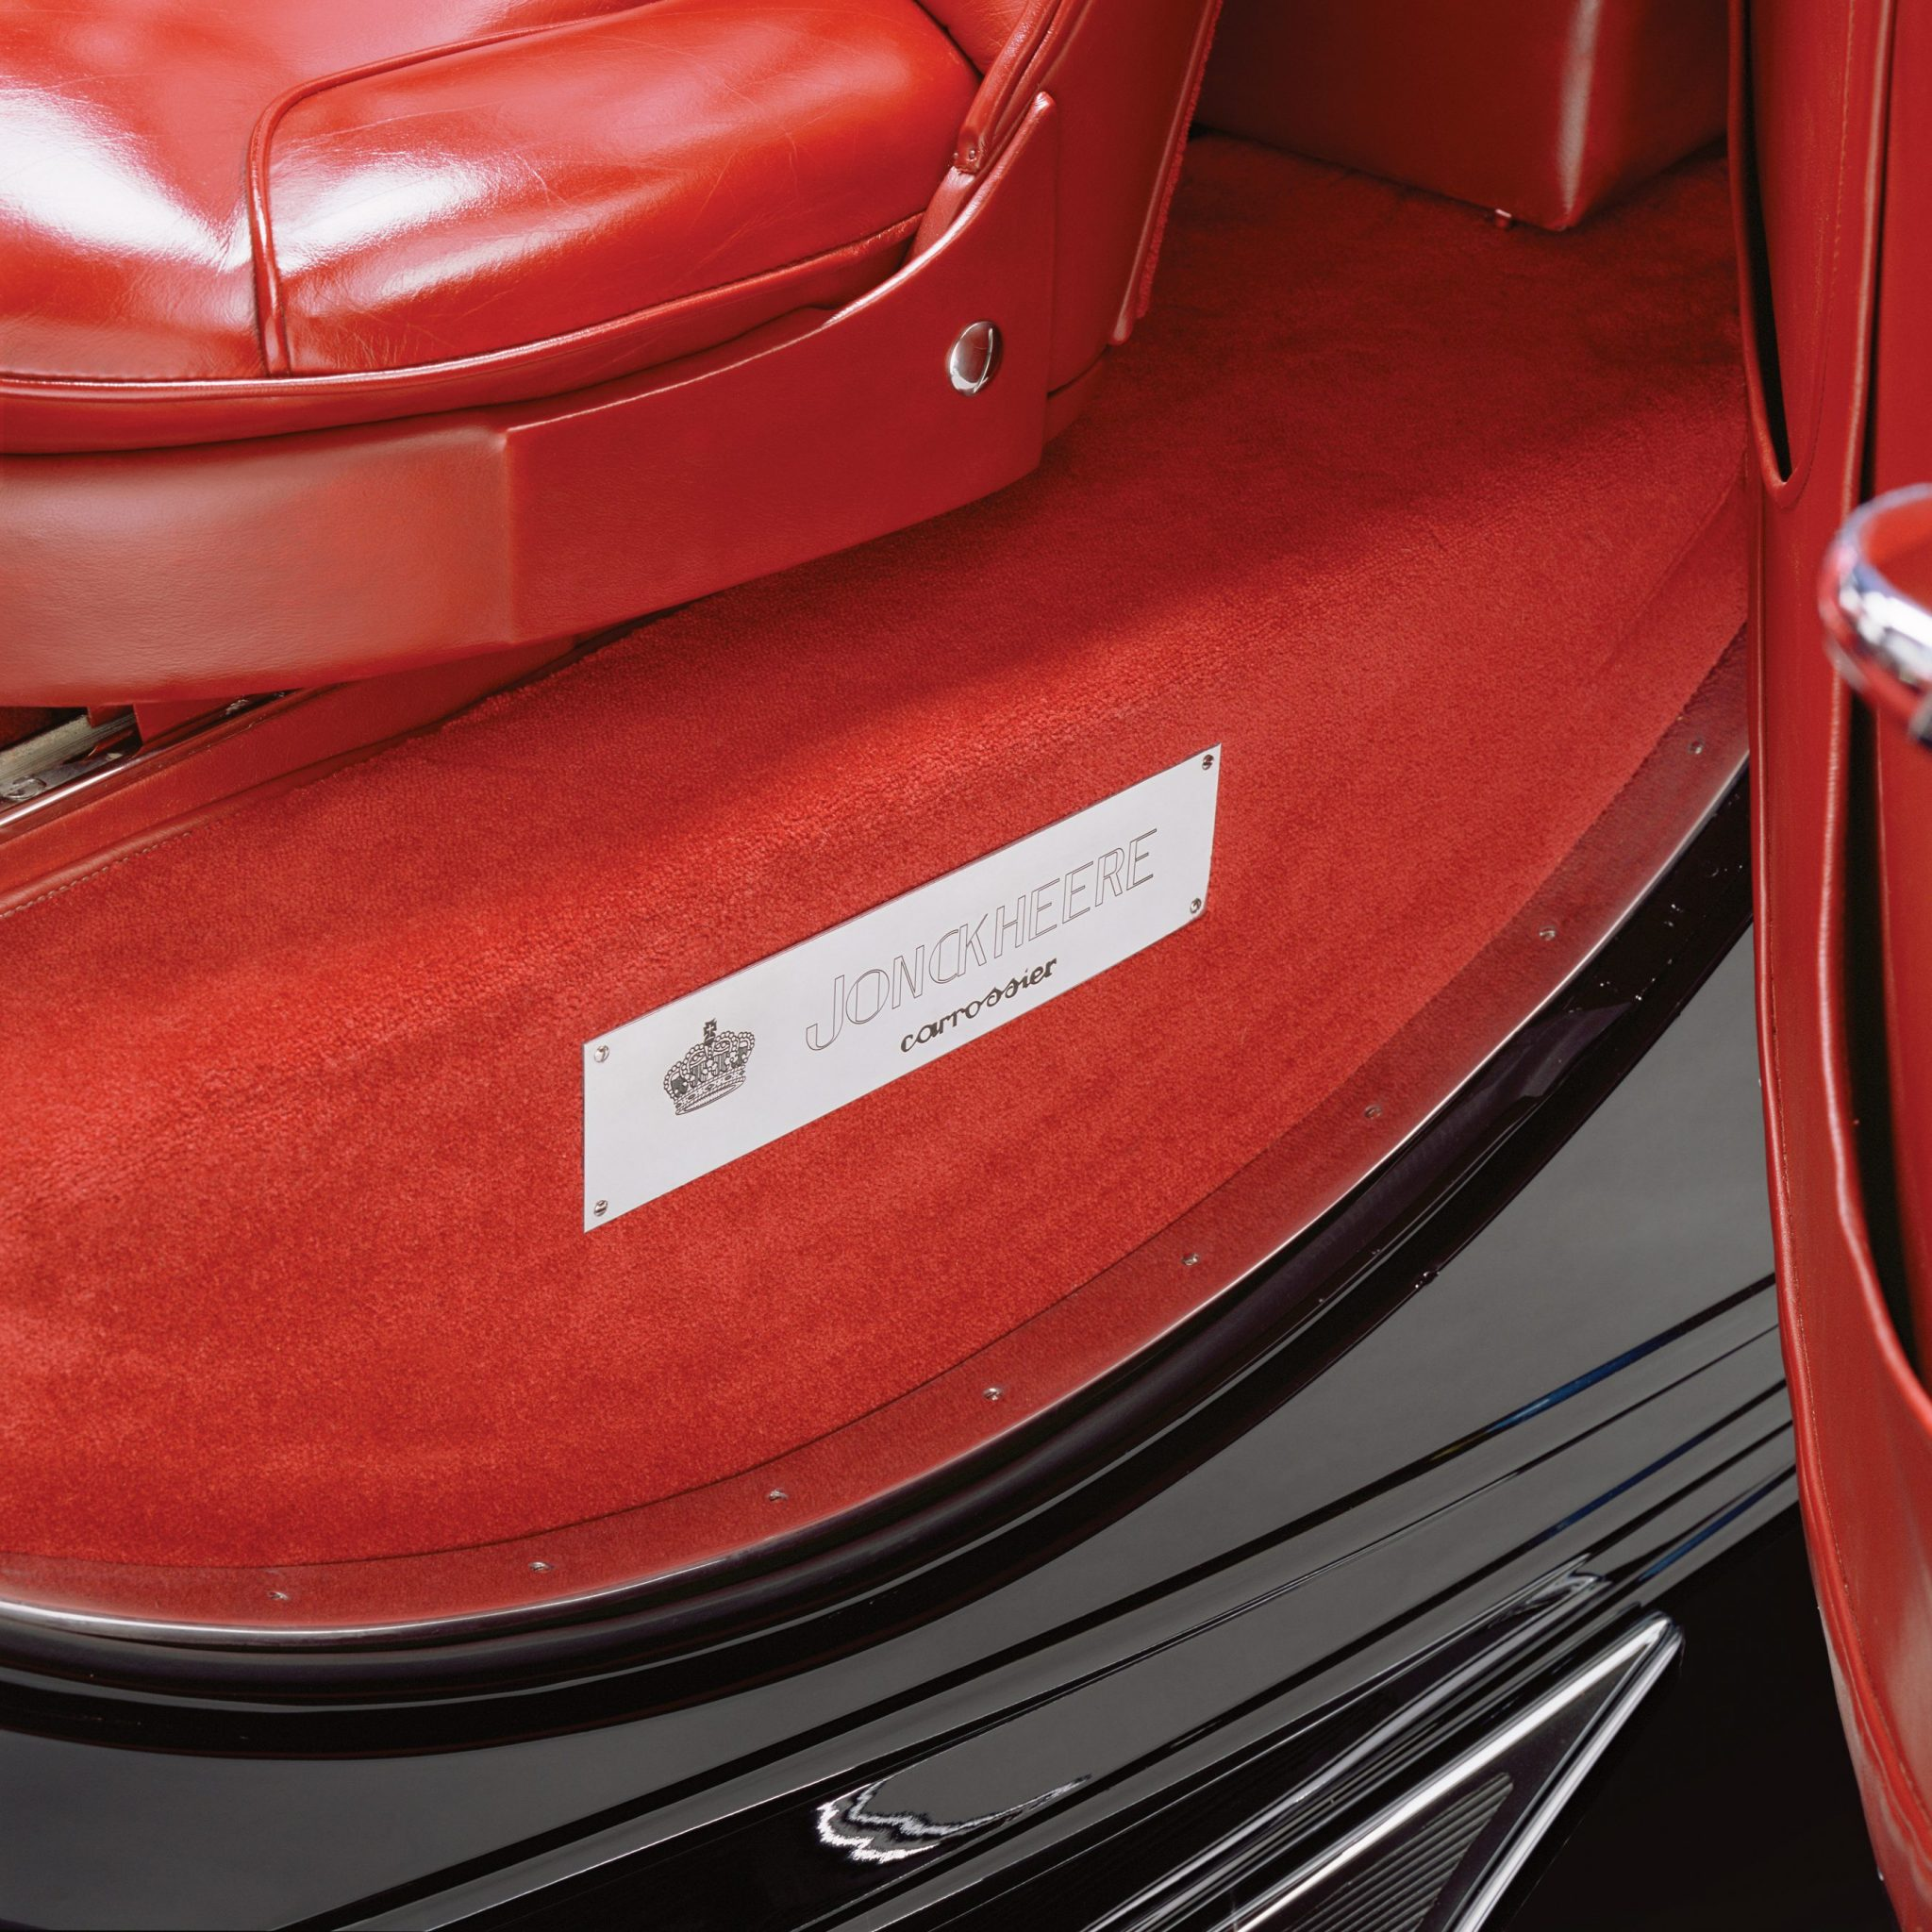 Rolls-Royce Jonckheere Coupe Doof Sill Plaque